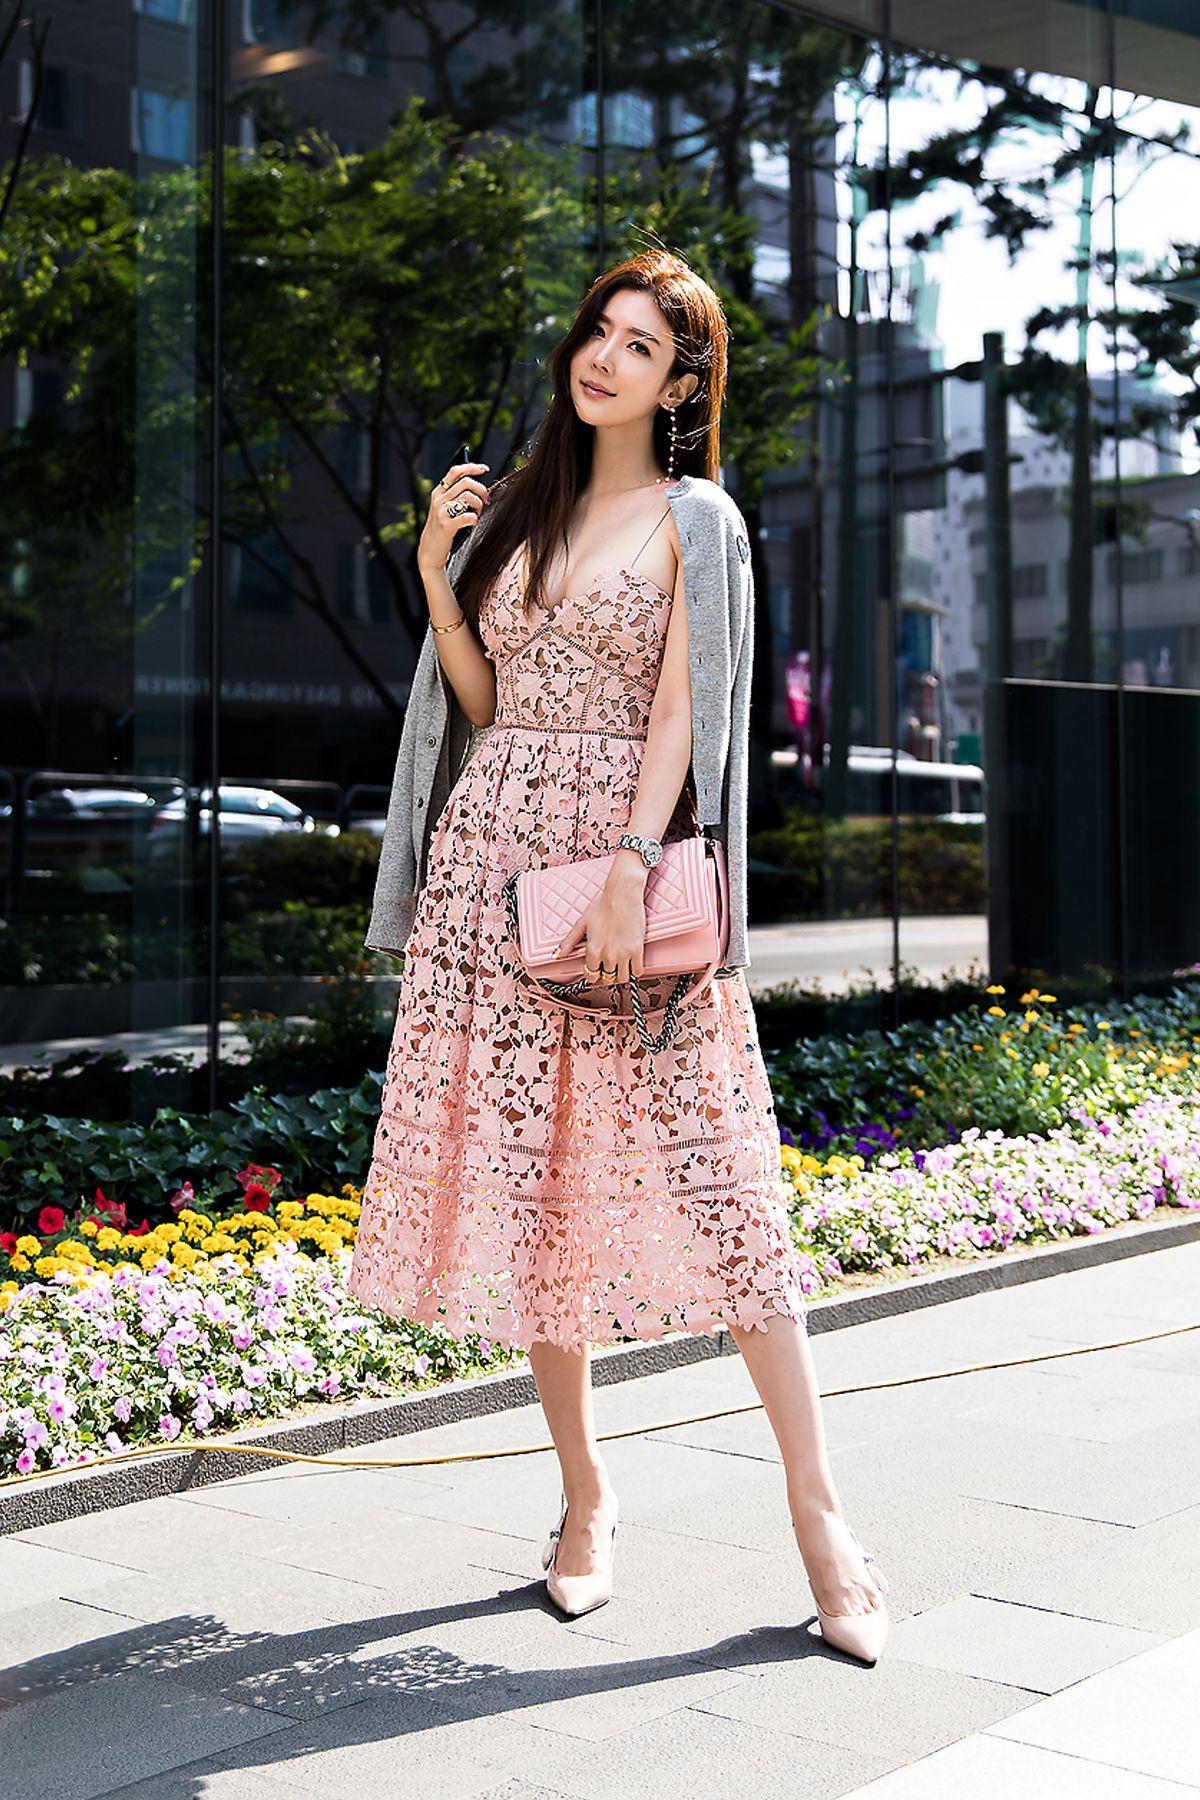 Choi Yujin, Street Fashion 2017 in Seoul | street womenstyle ...